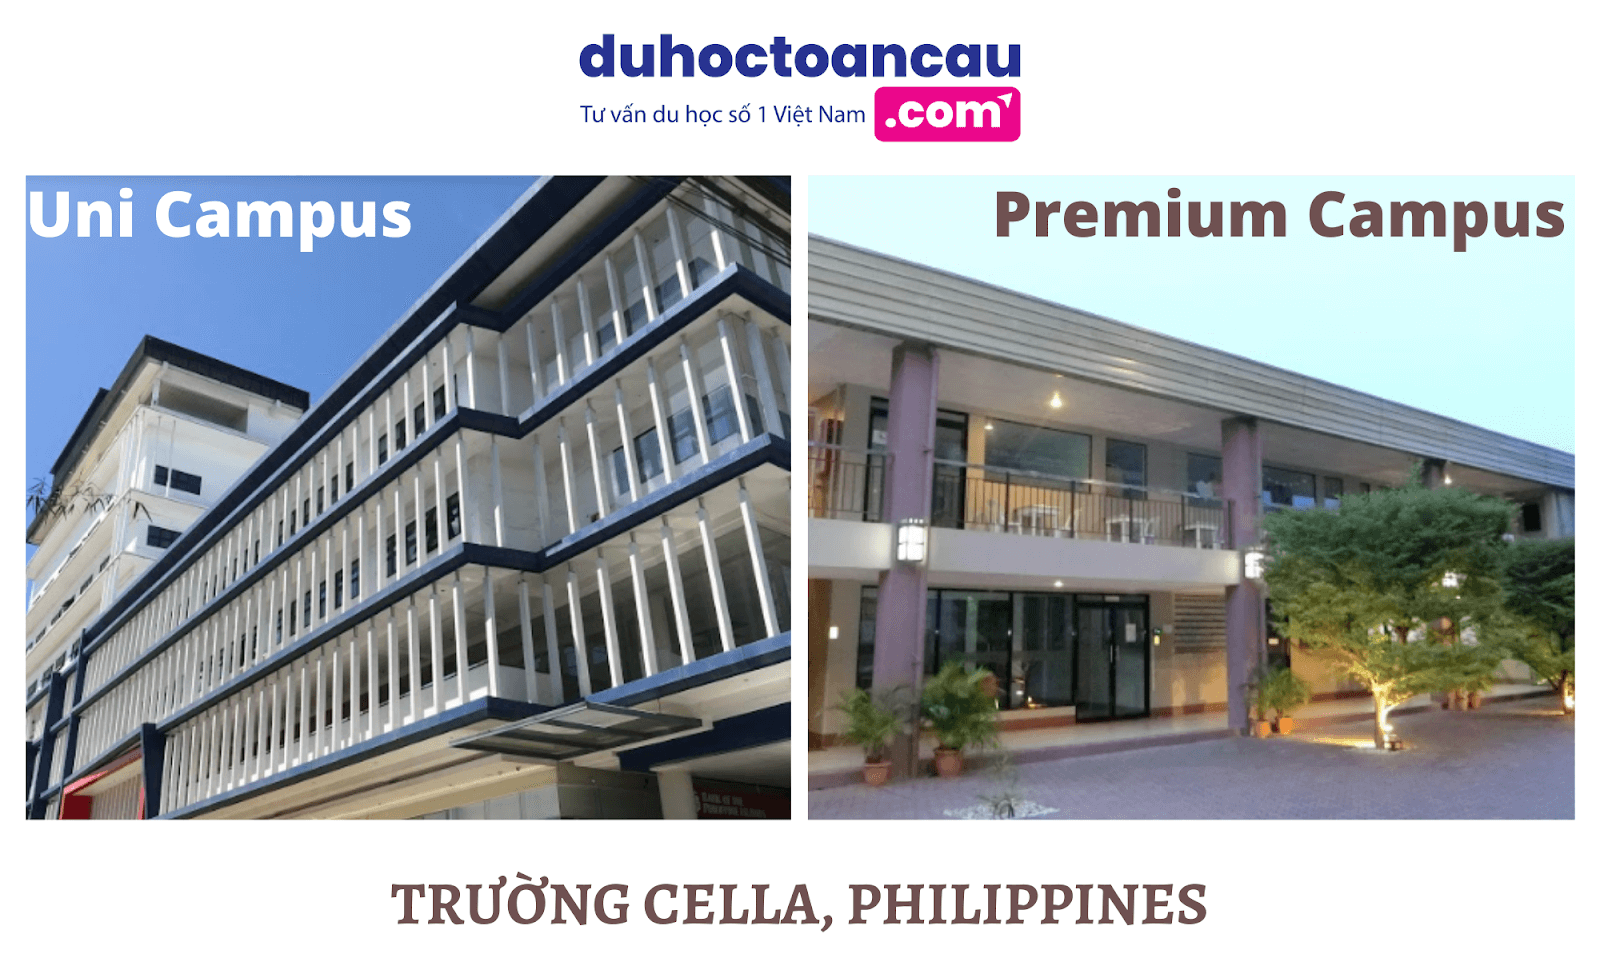 truong-cella-phillipines